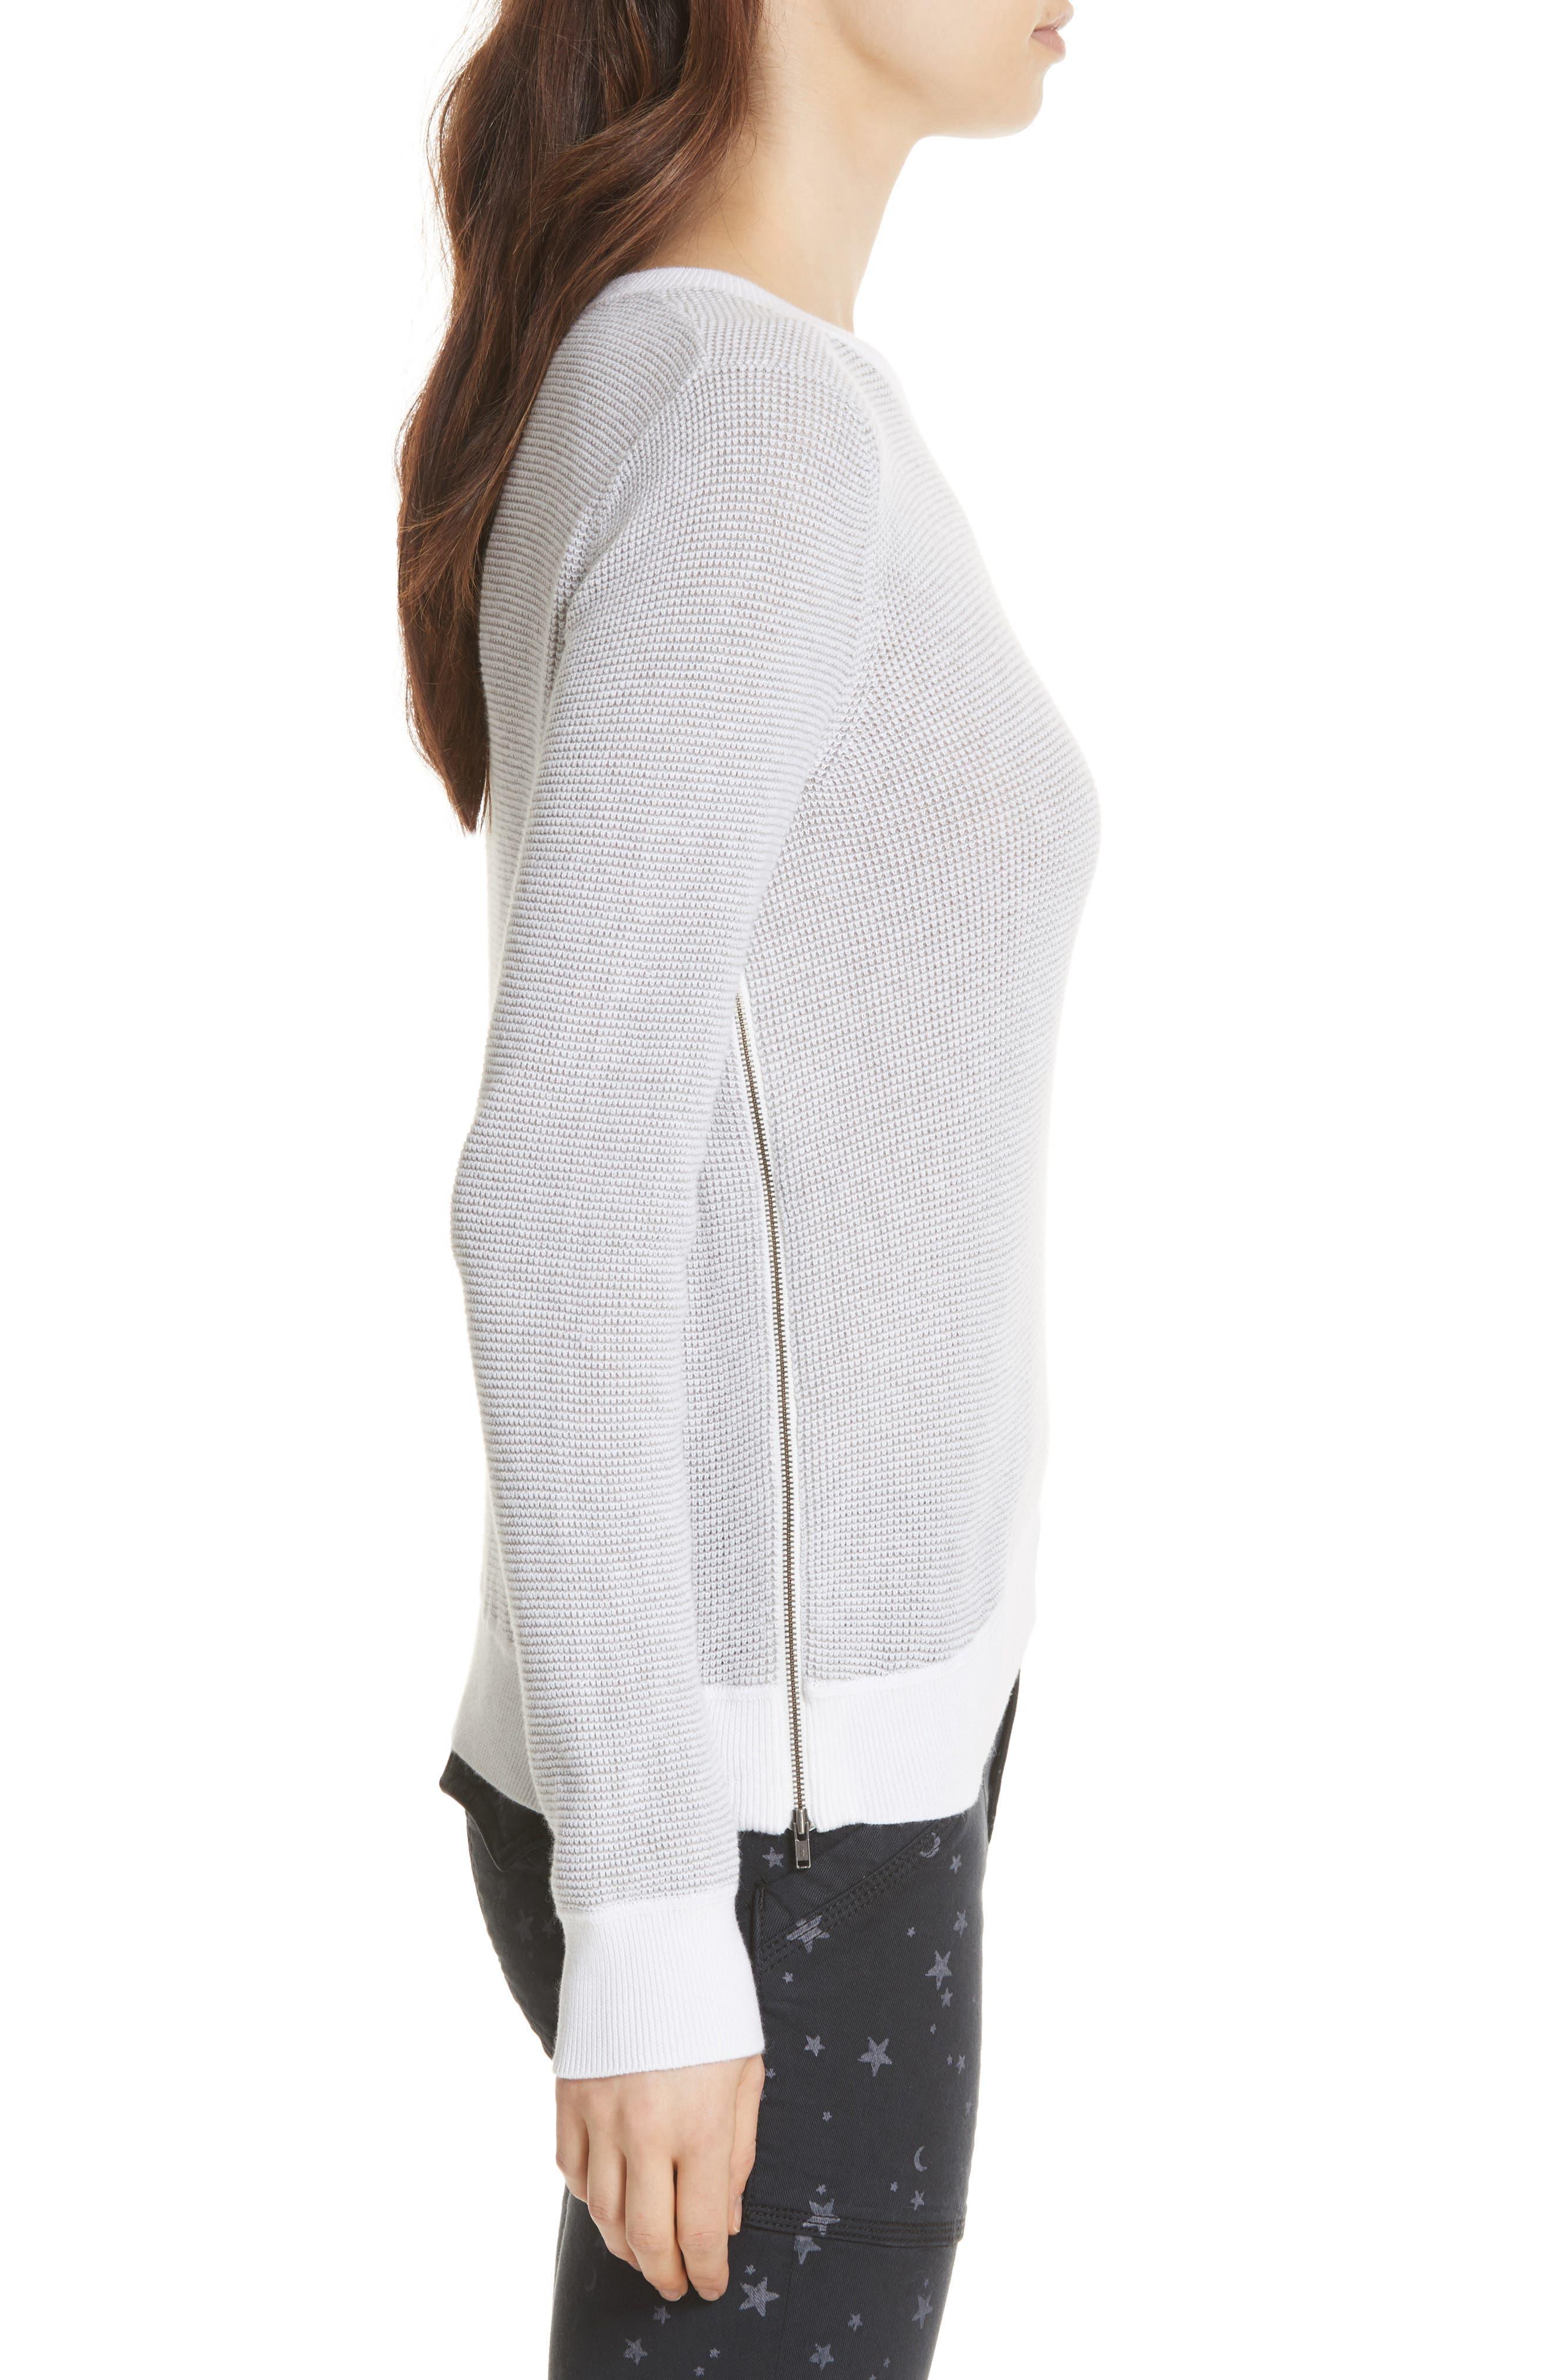 Laurana Cotton & Cashmere Sweater,                             Alternate thumbnail 3, color,                             Porcelain/ Heather Grey